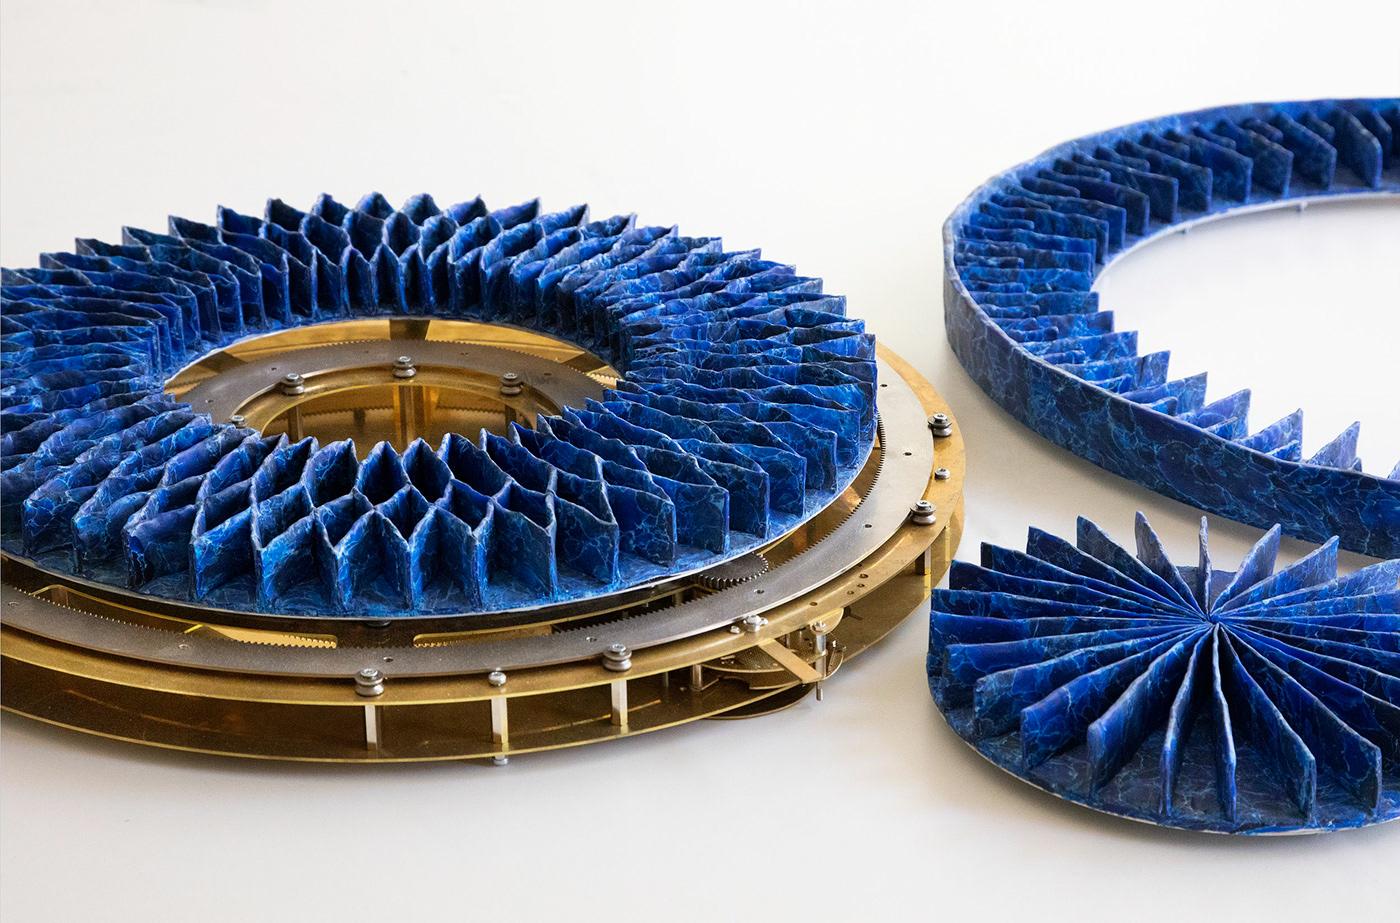 art bizar ceramic cool craftsmanship handmade kinetic machine MOVING sculpture